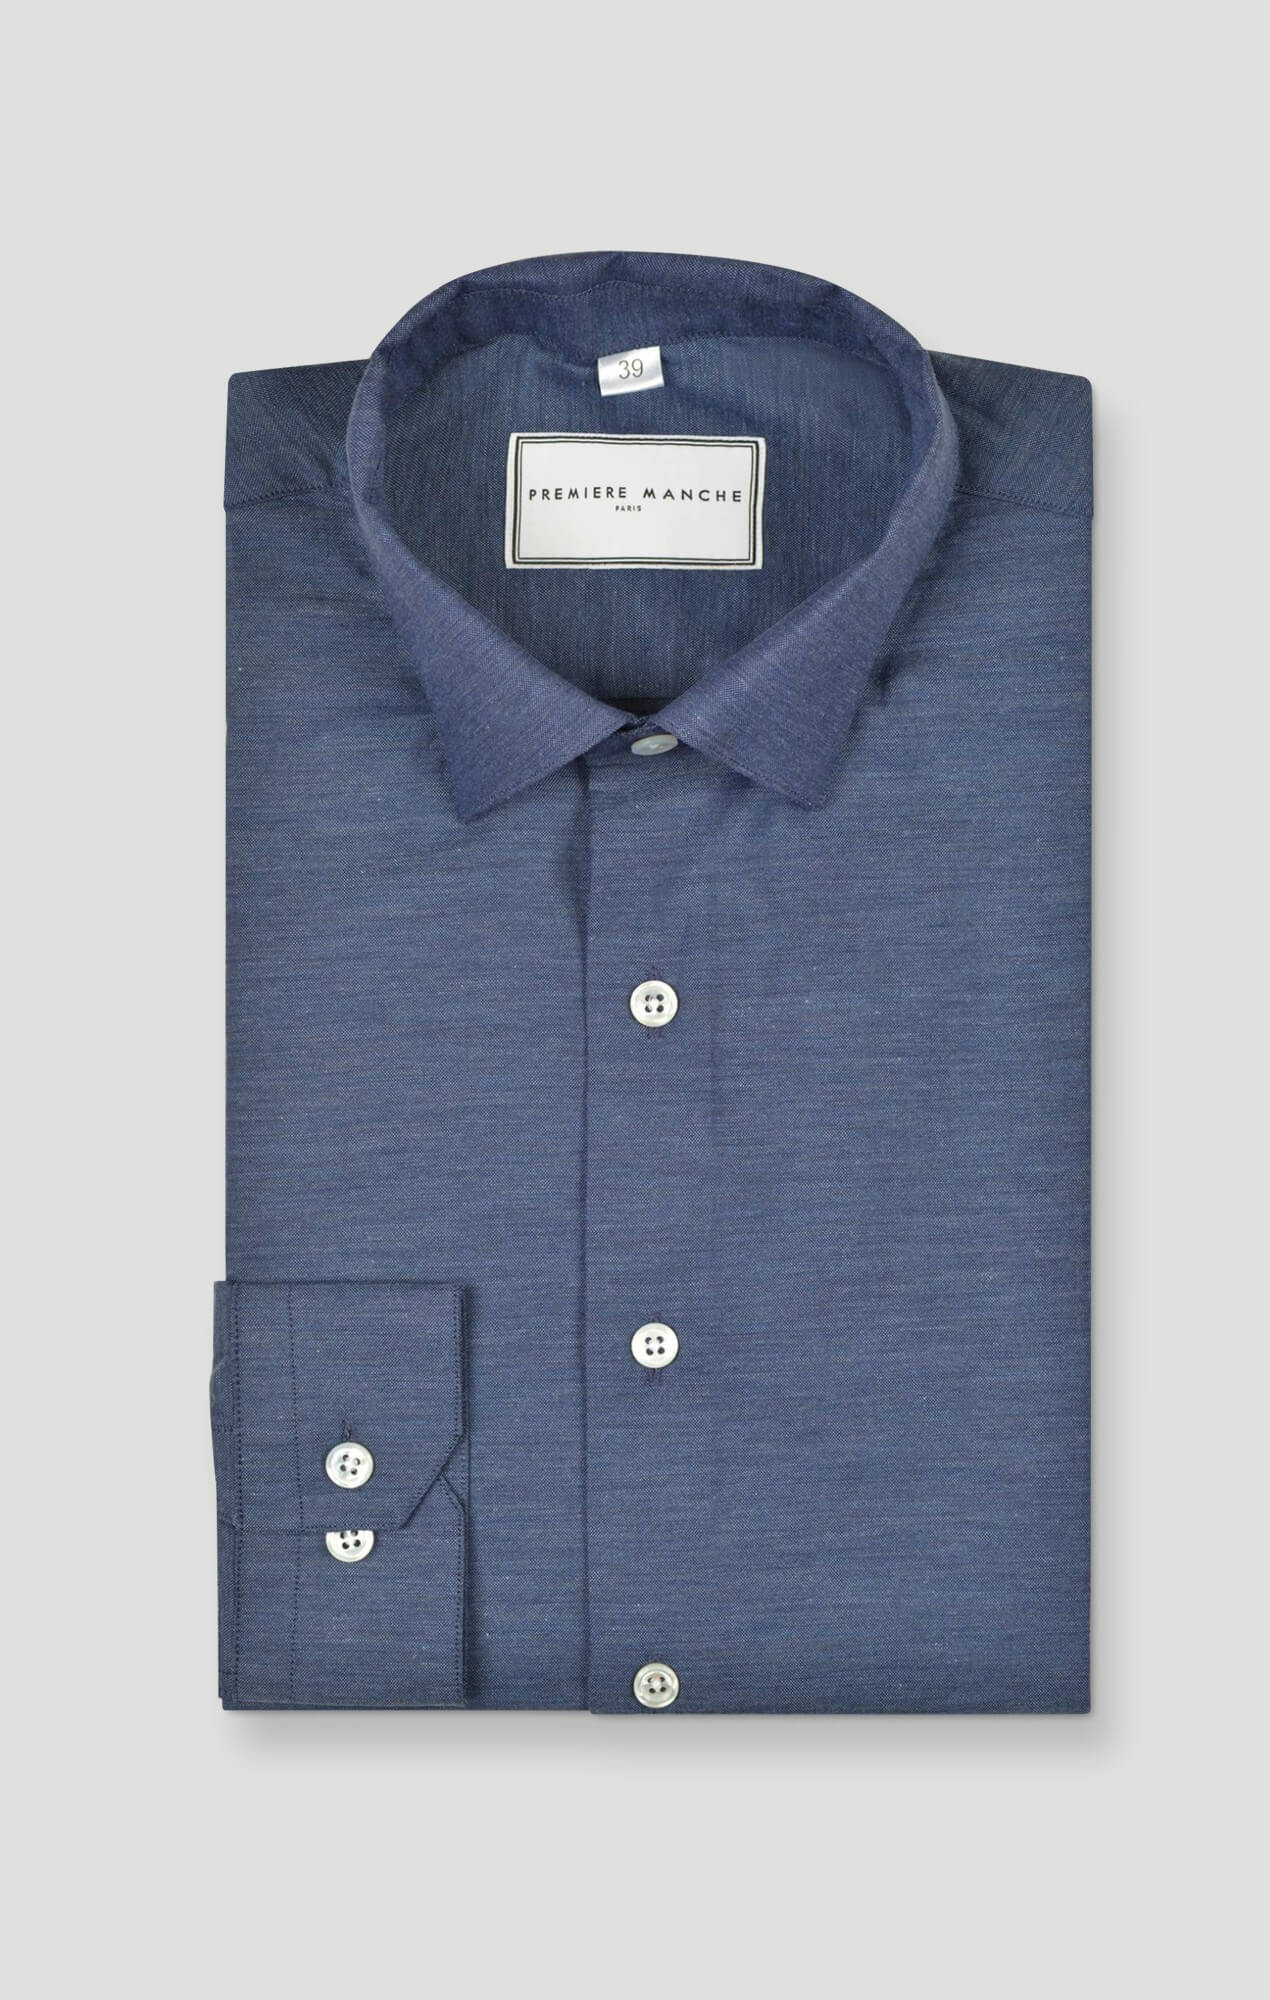 Chemise oxford bleu marine Toutes nos chemises